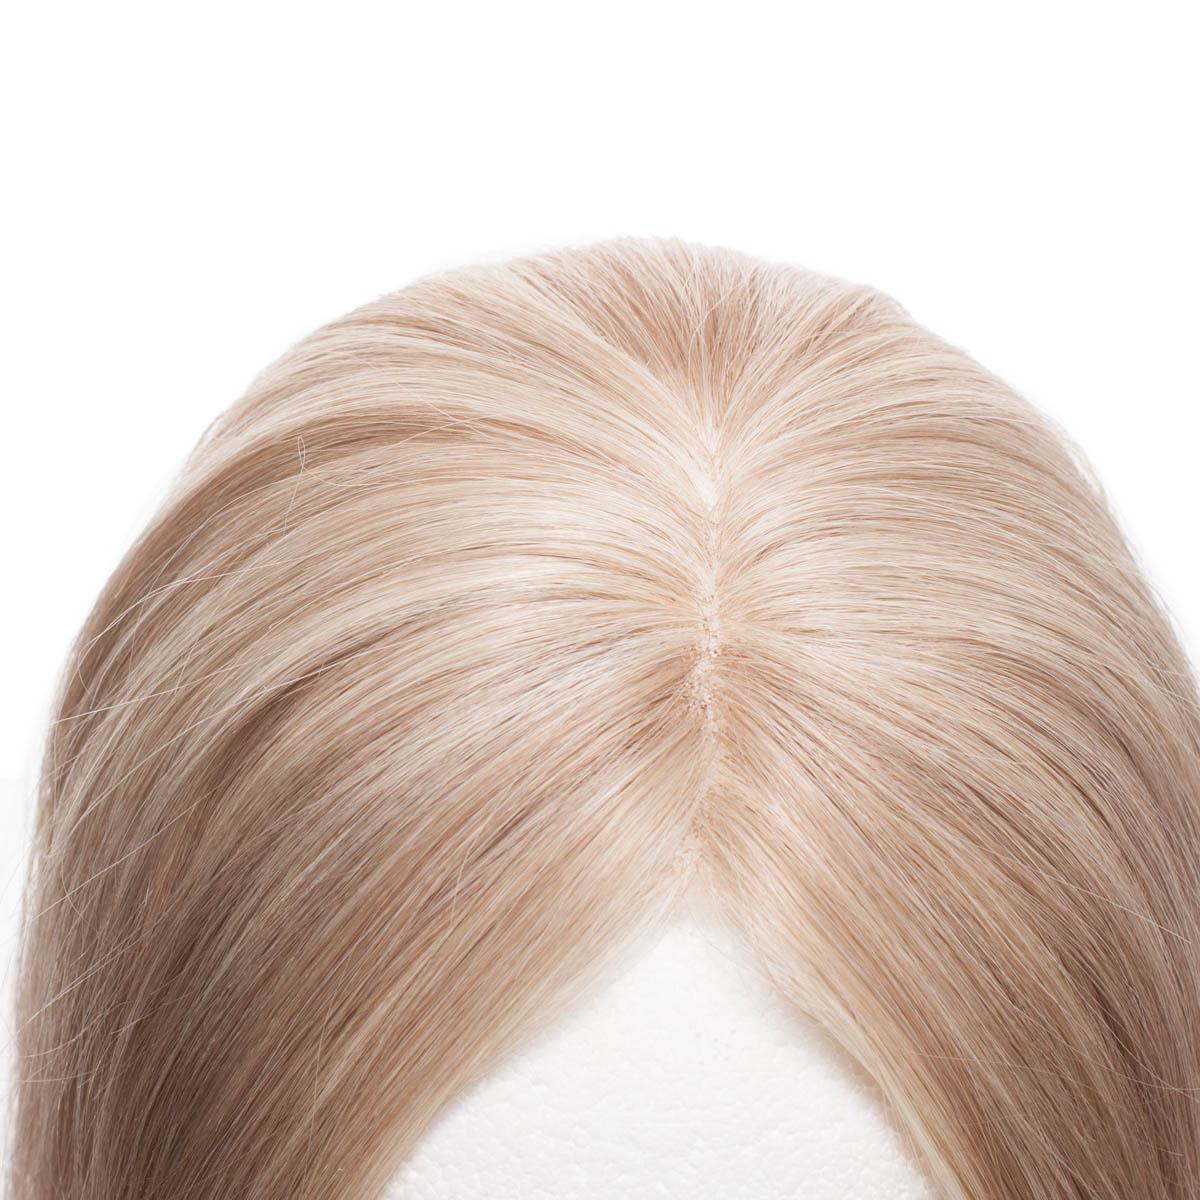 Top Piece Original Glatt M7.3/10.8 Cendre Ash Blonde Mix 30 cm